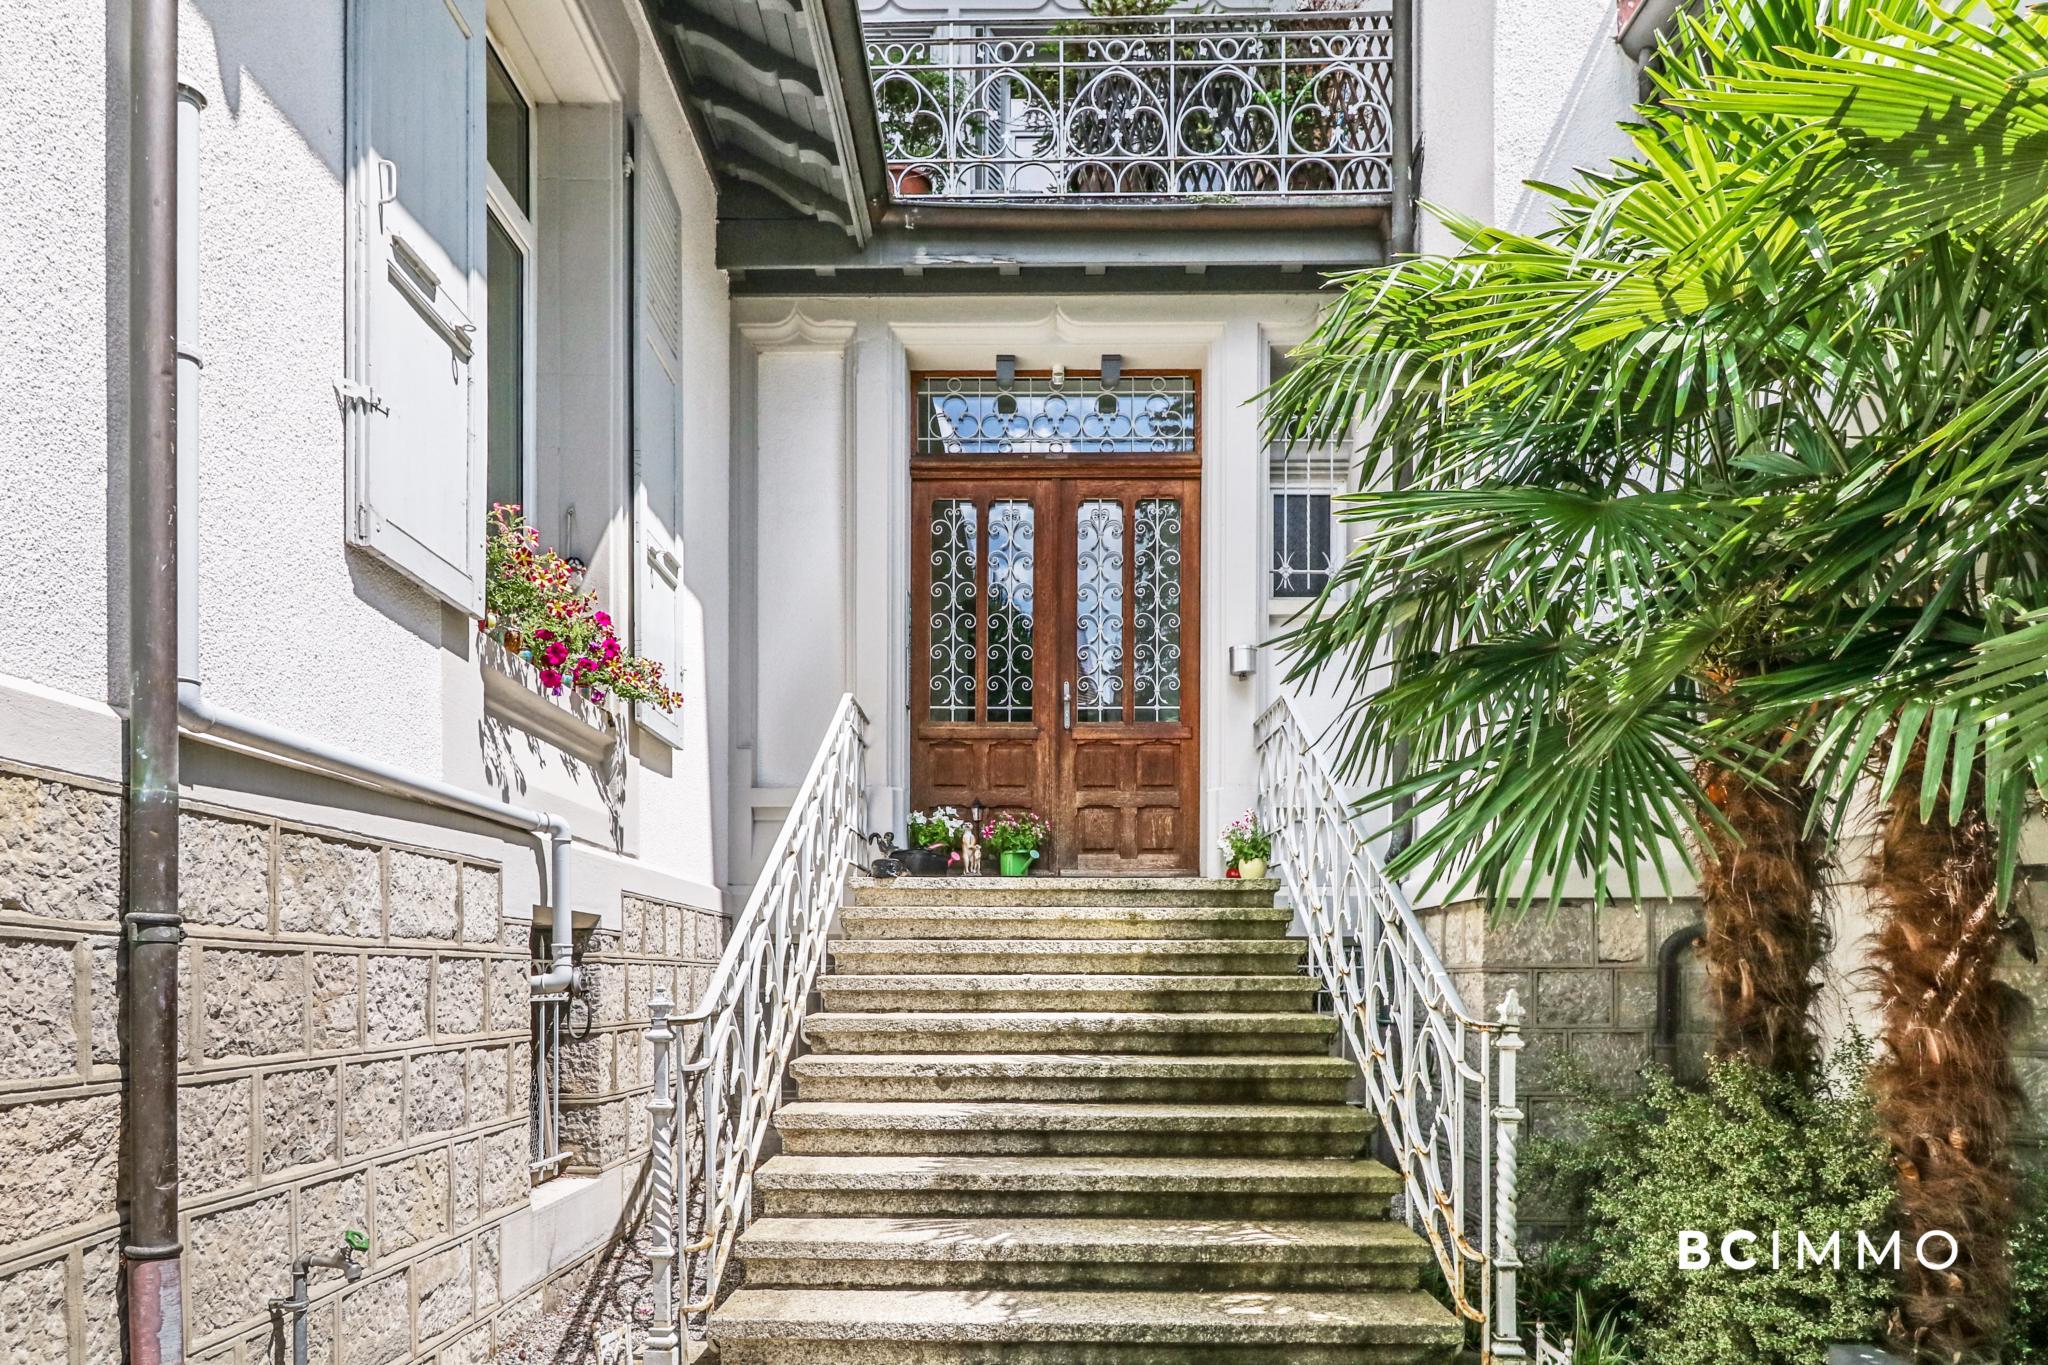 BC Immo - 3 Appartements pour investisseur - Situation exceptionnelle - 1005LB3